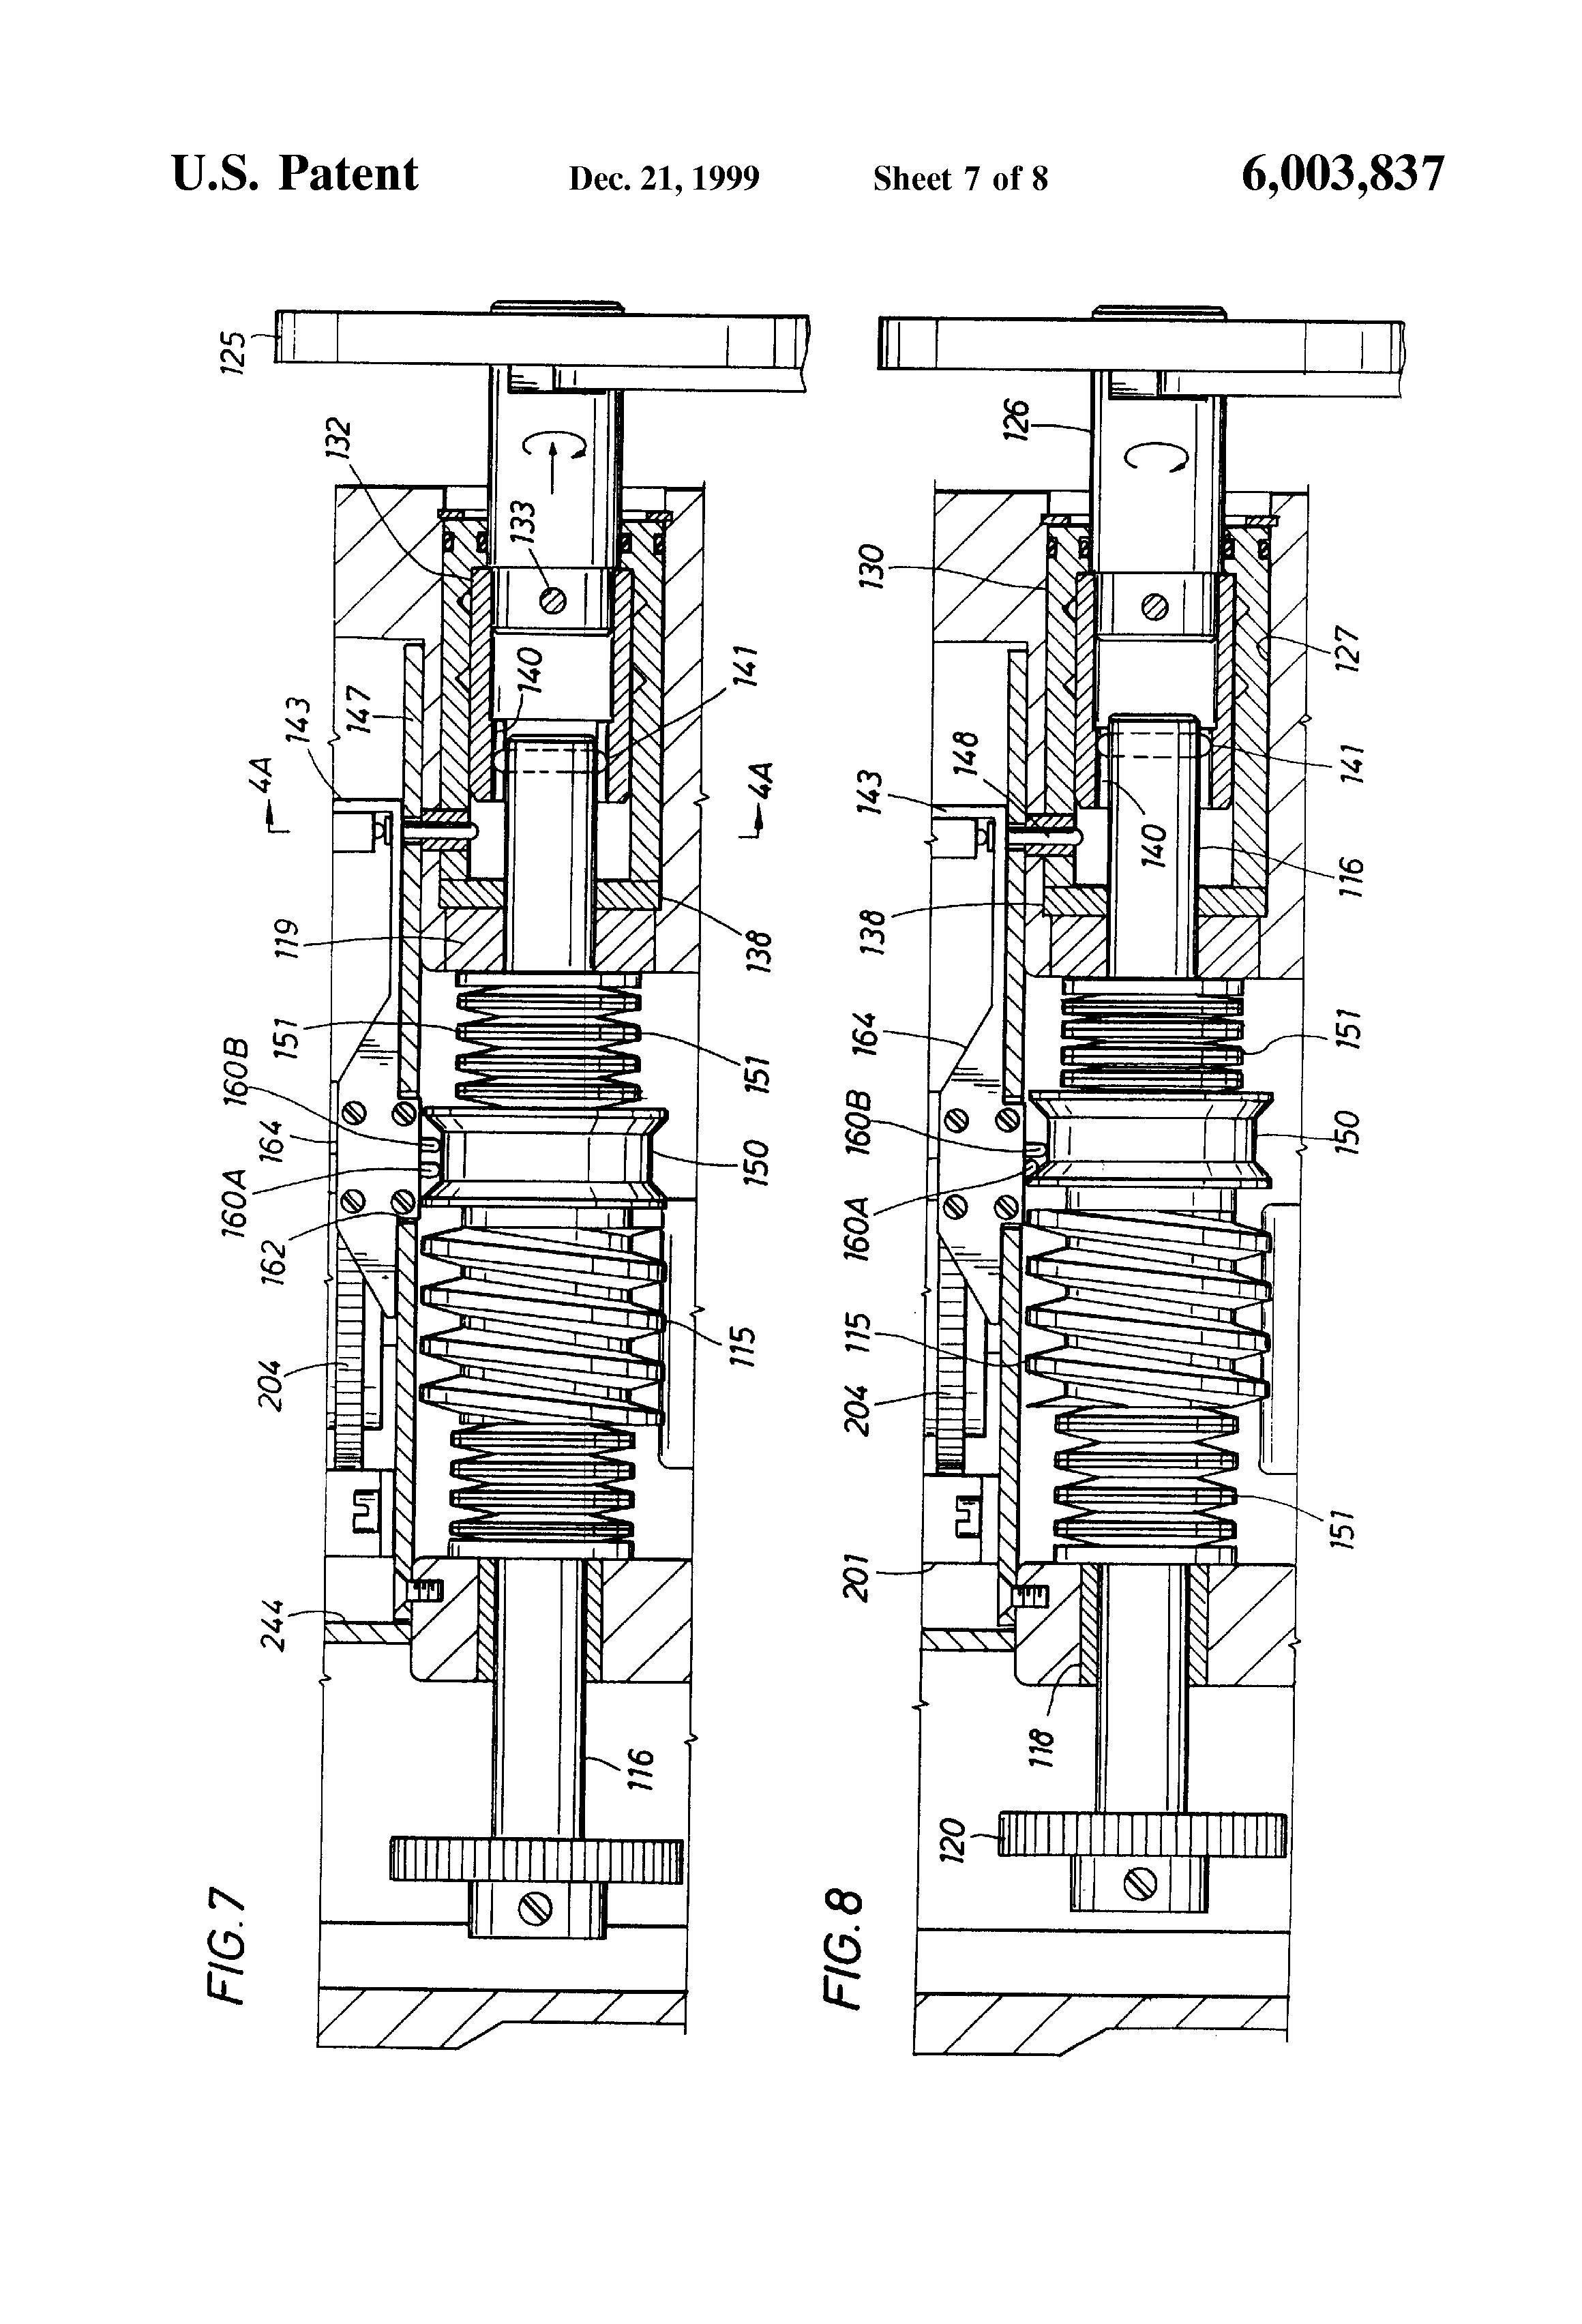 Rotork Wiring Diagram 100 2000 4 Gandul 457779119 – Tp100 Wiring Diagram